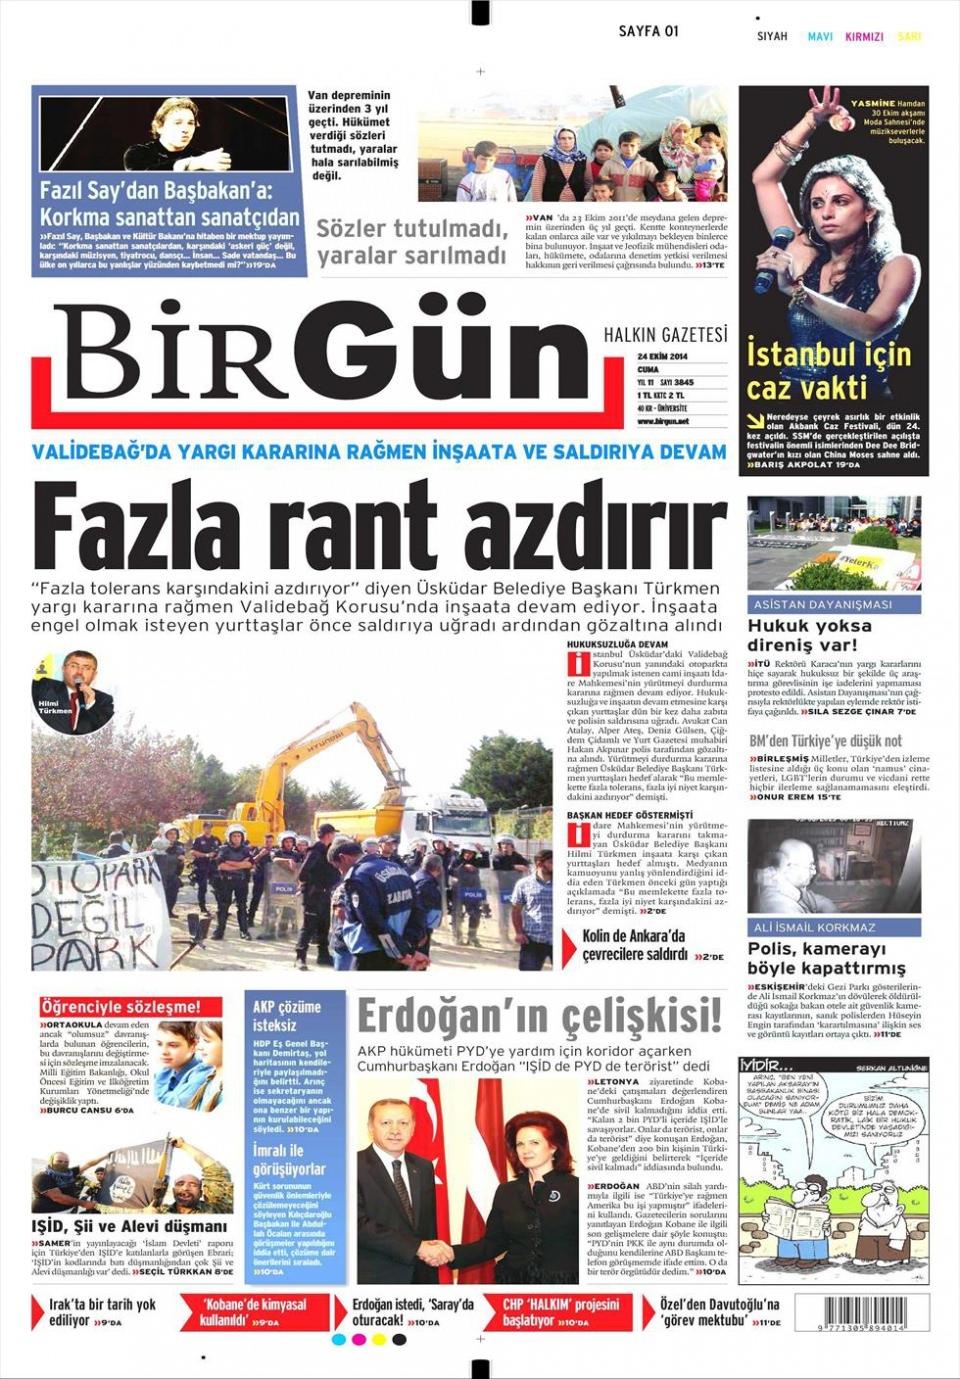 24 Ekim 2014 gazete manşetleri 3